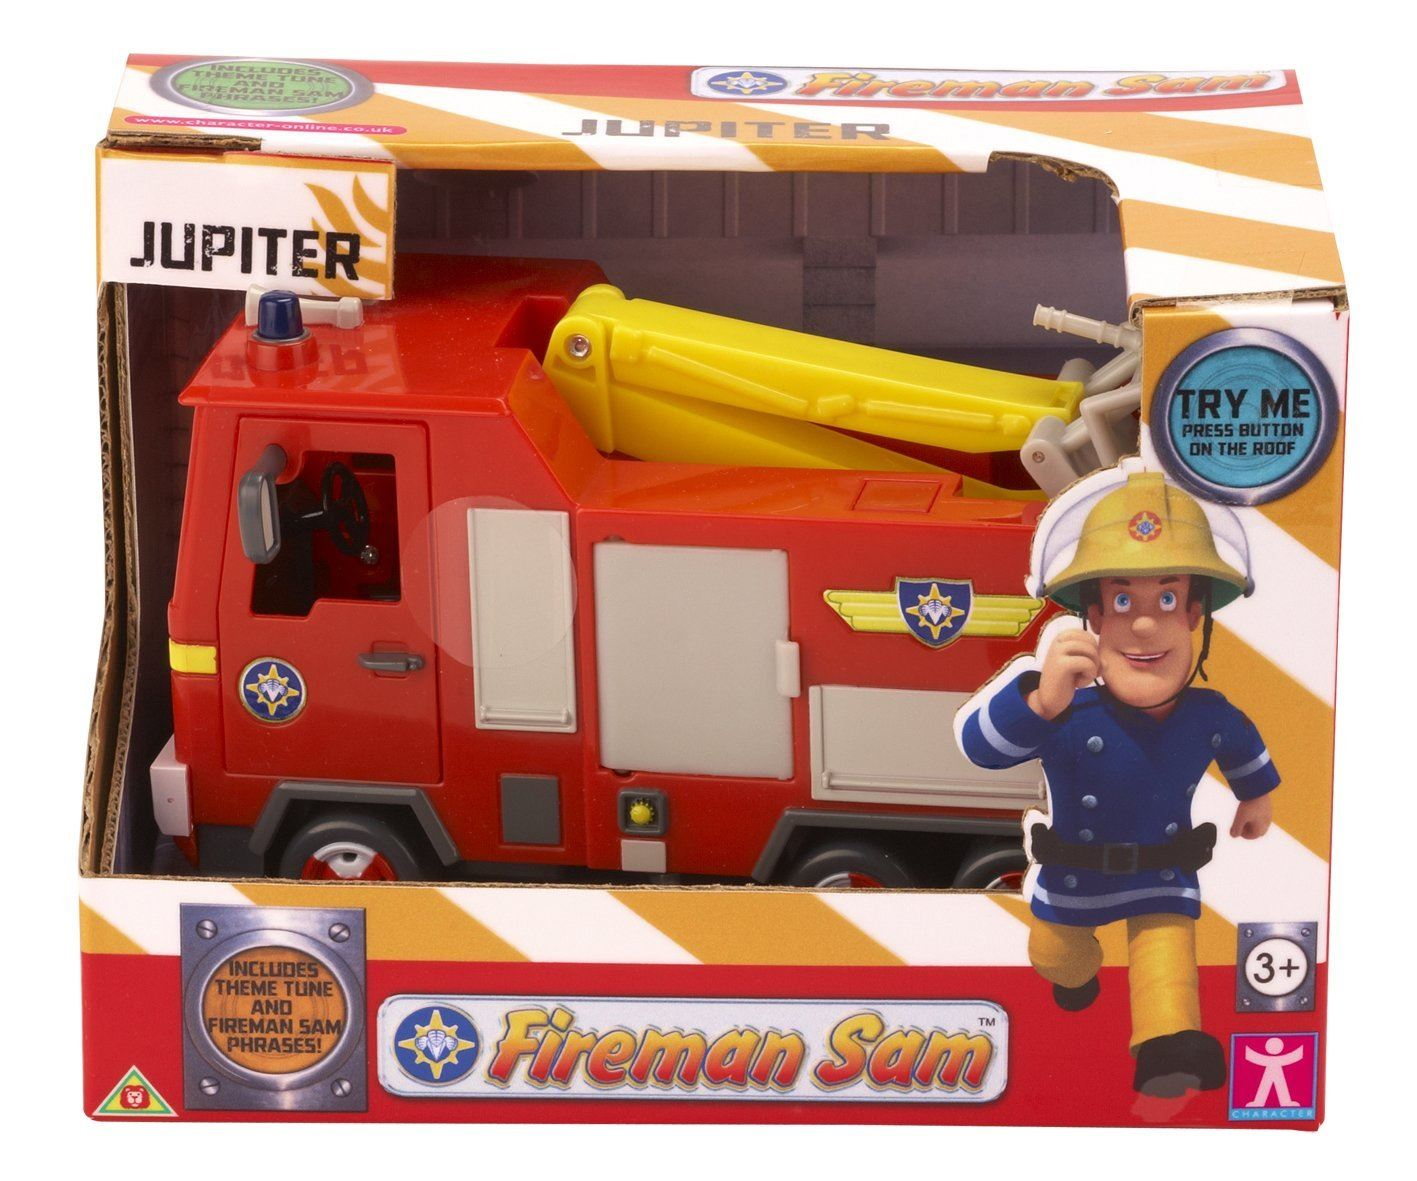 Best Fireman Sam Toys Kids : Fireman sam vehicle jupiter character options